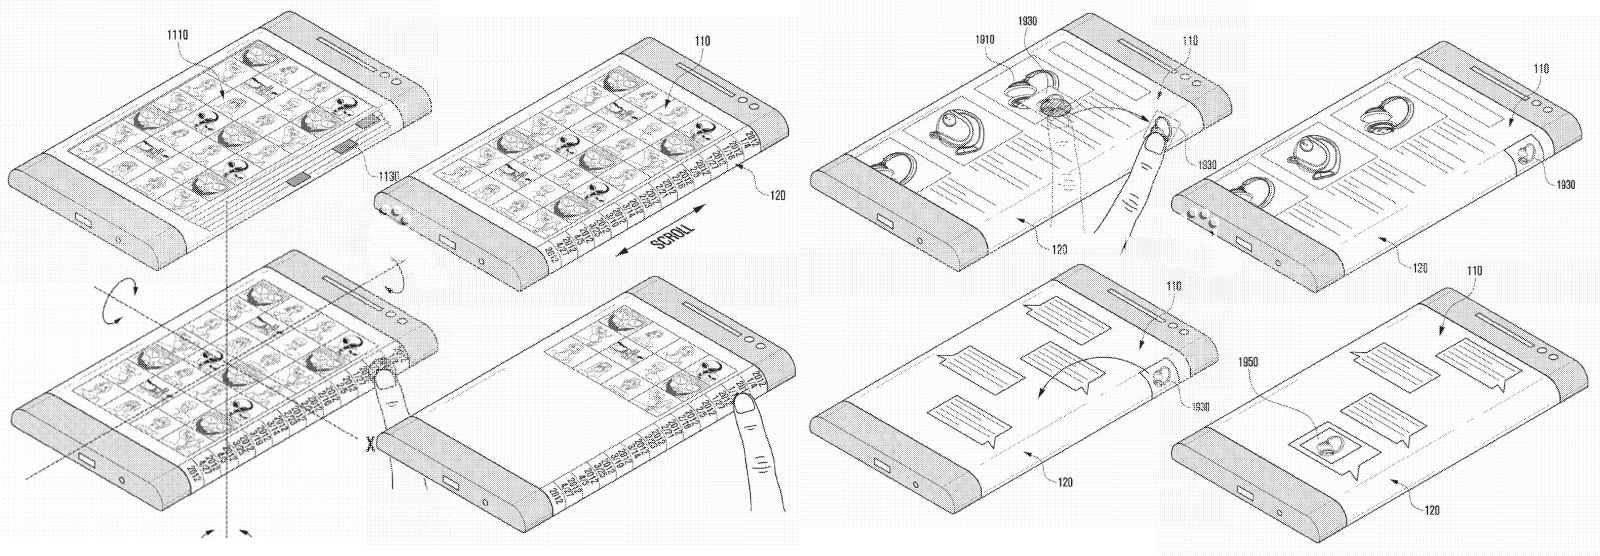 Patent Samsung Ecran Curbat -1- ilovesamsung